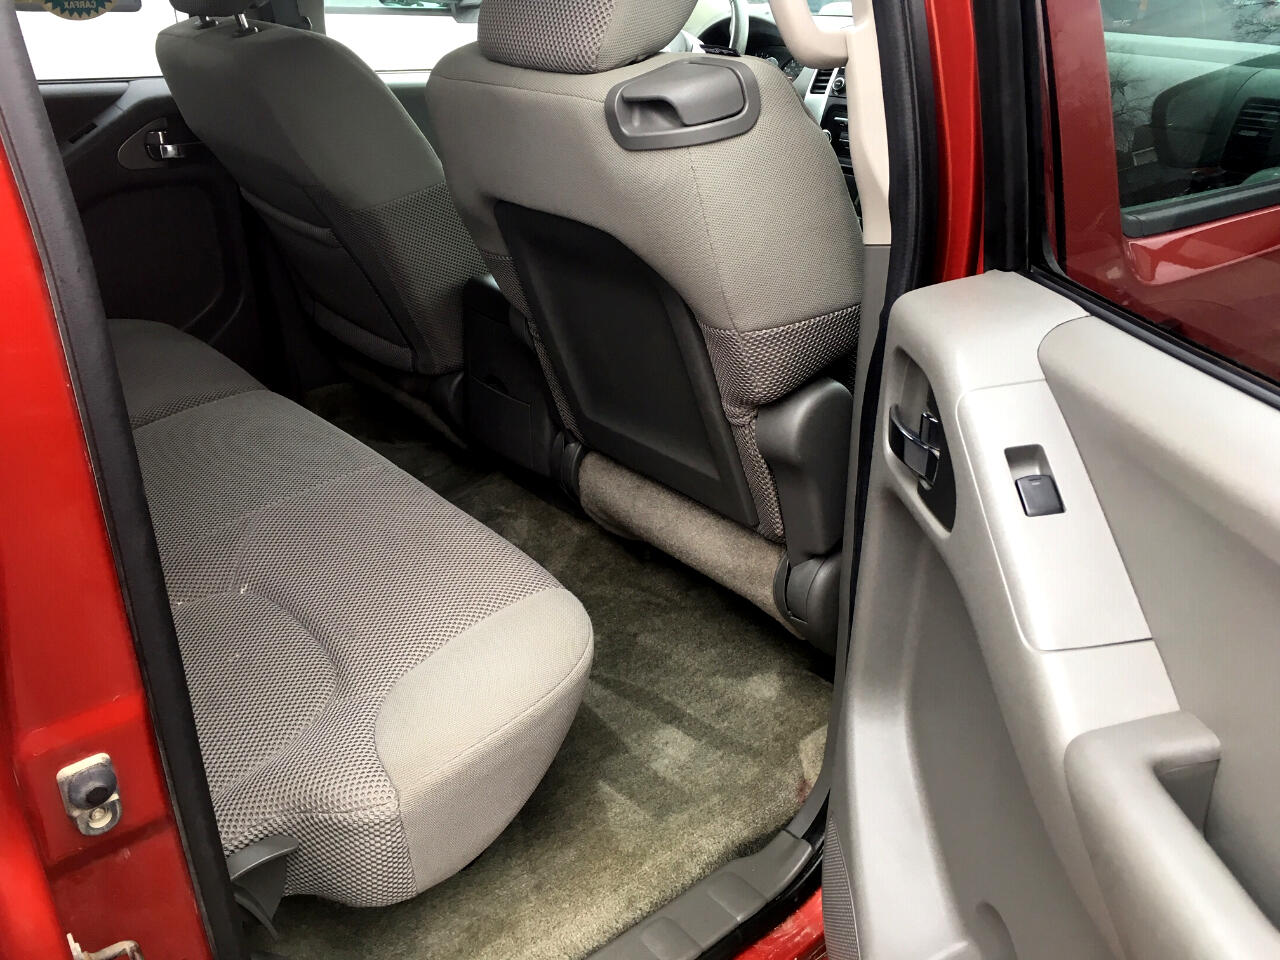 2014 Nissan Frontier 4WD Crew Cab SWB Auto SV